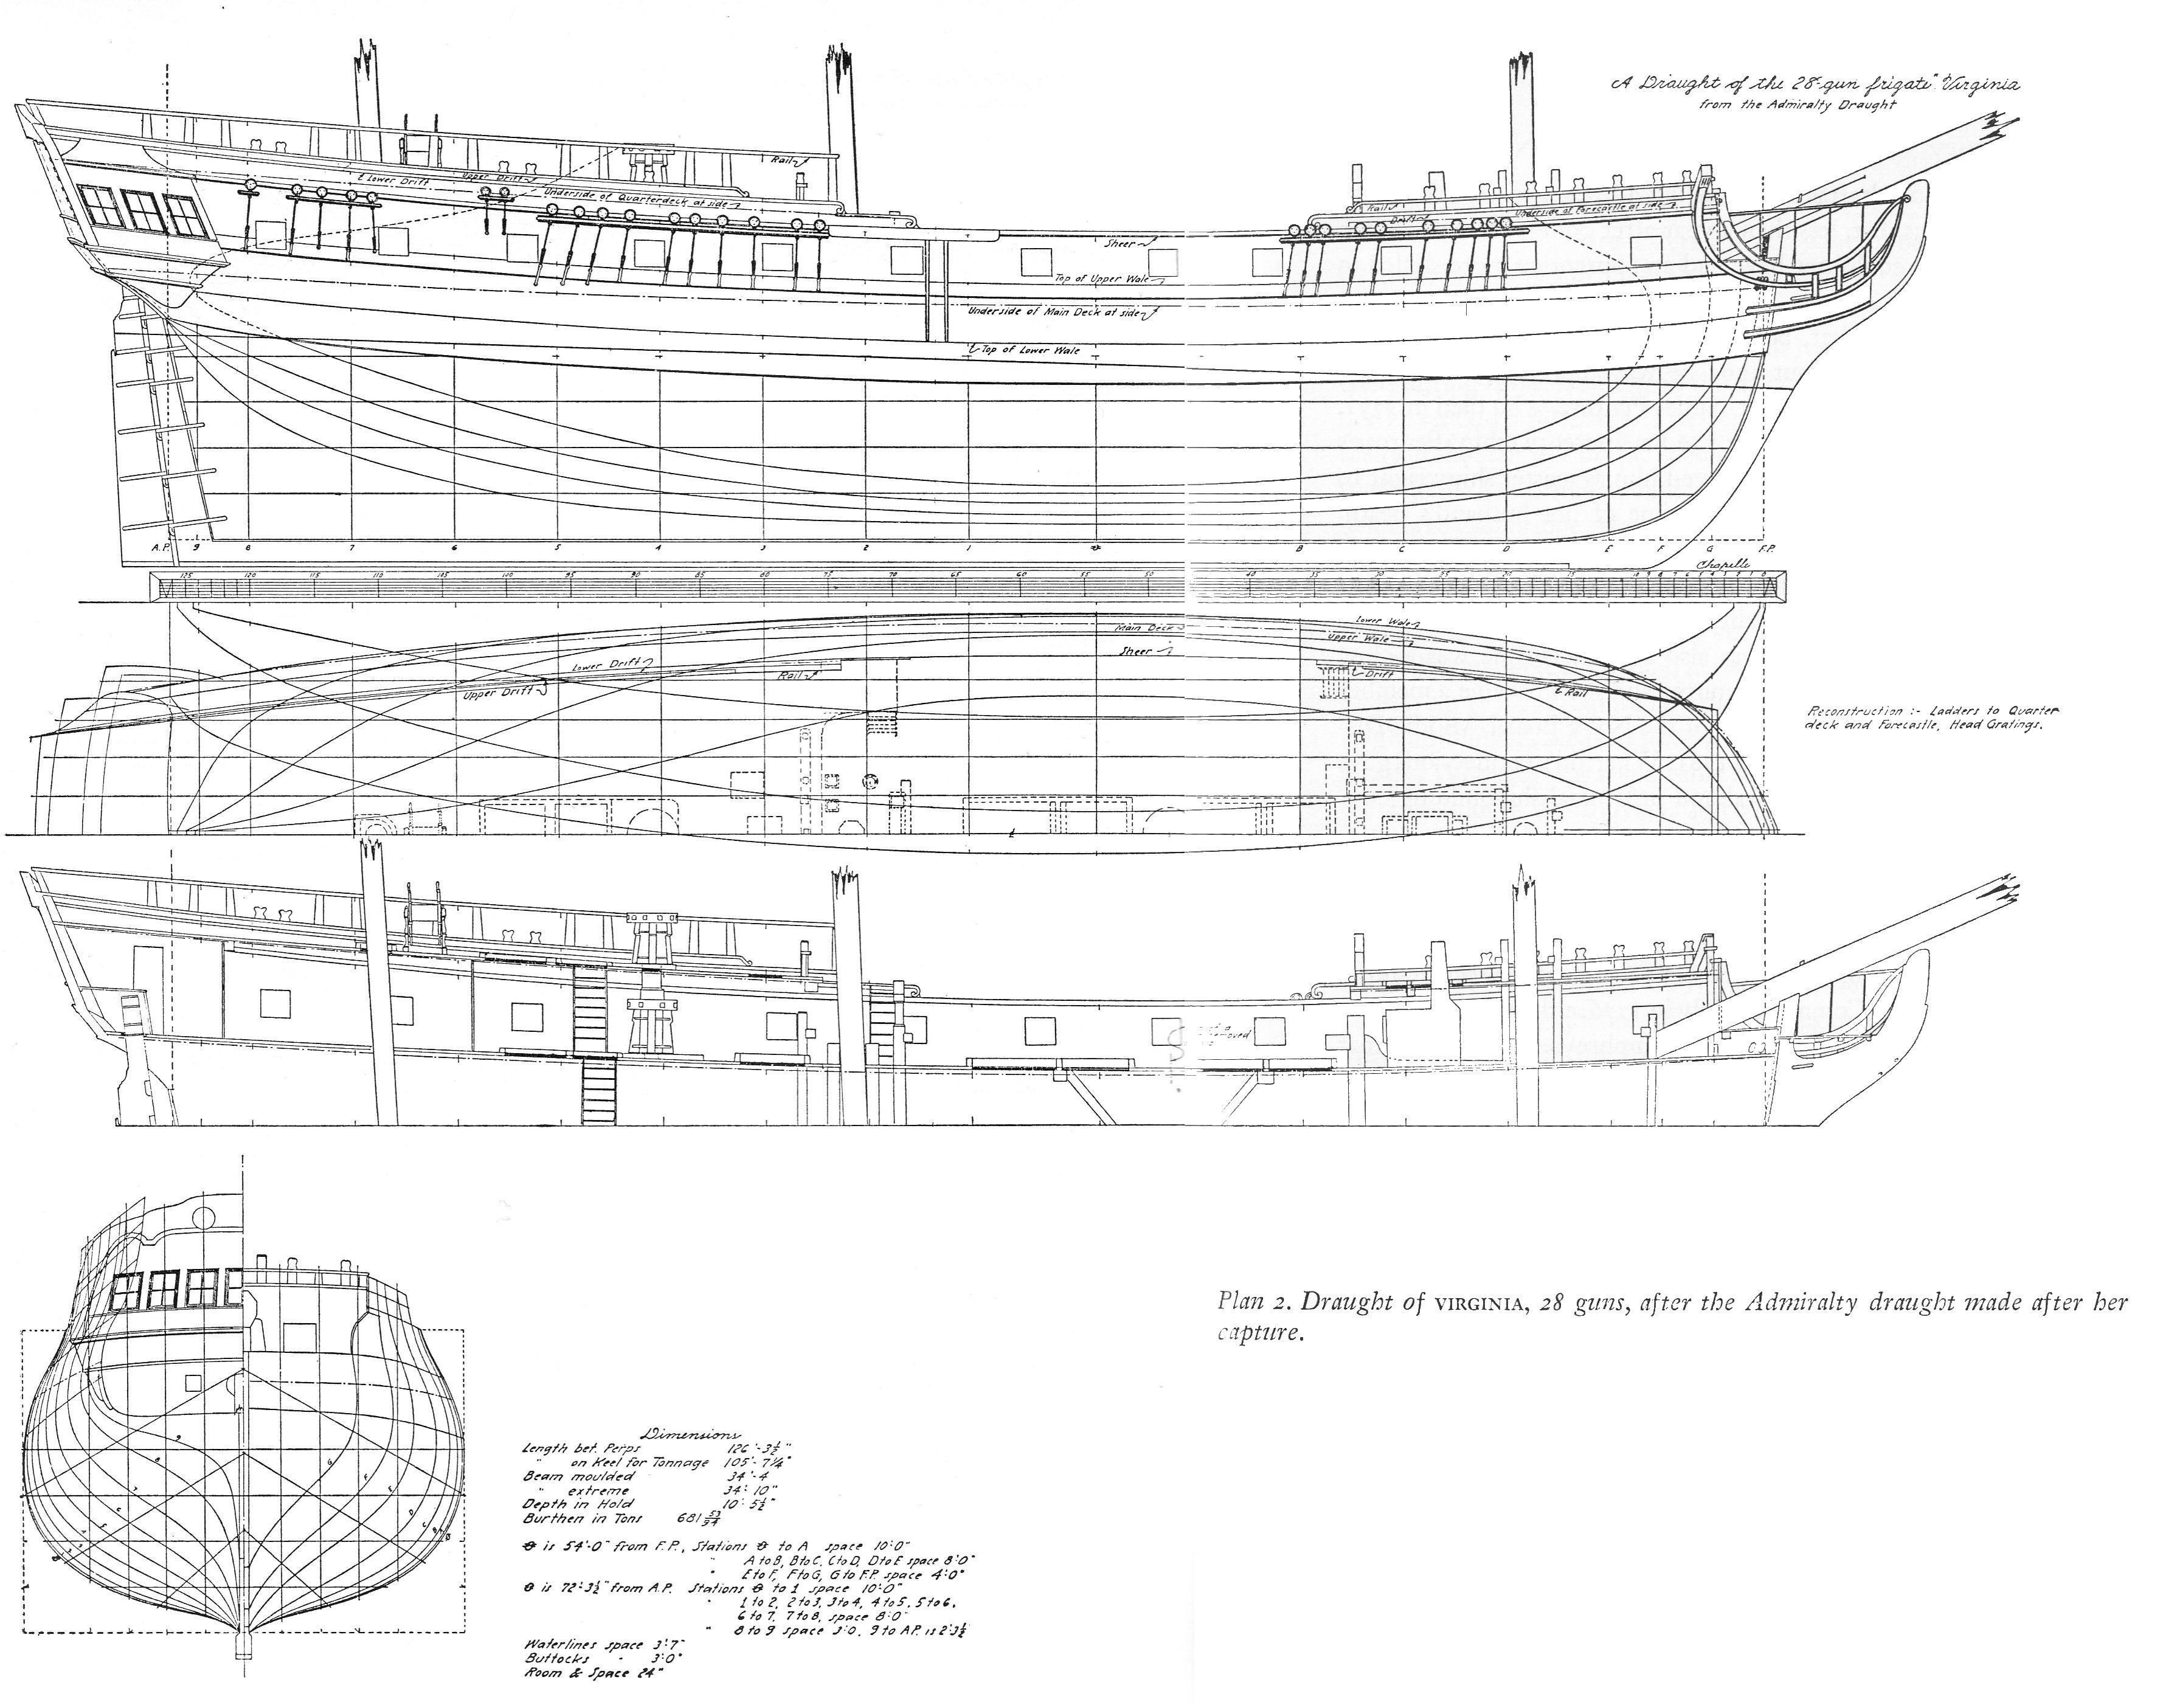 Continental Navy Ship Virginia Nicholson